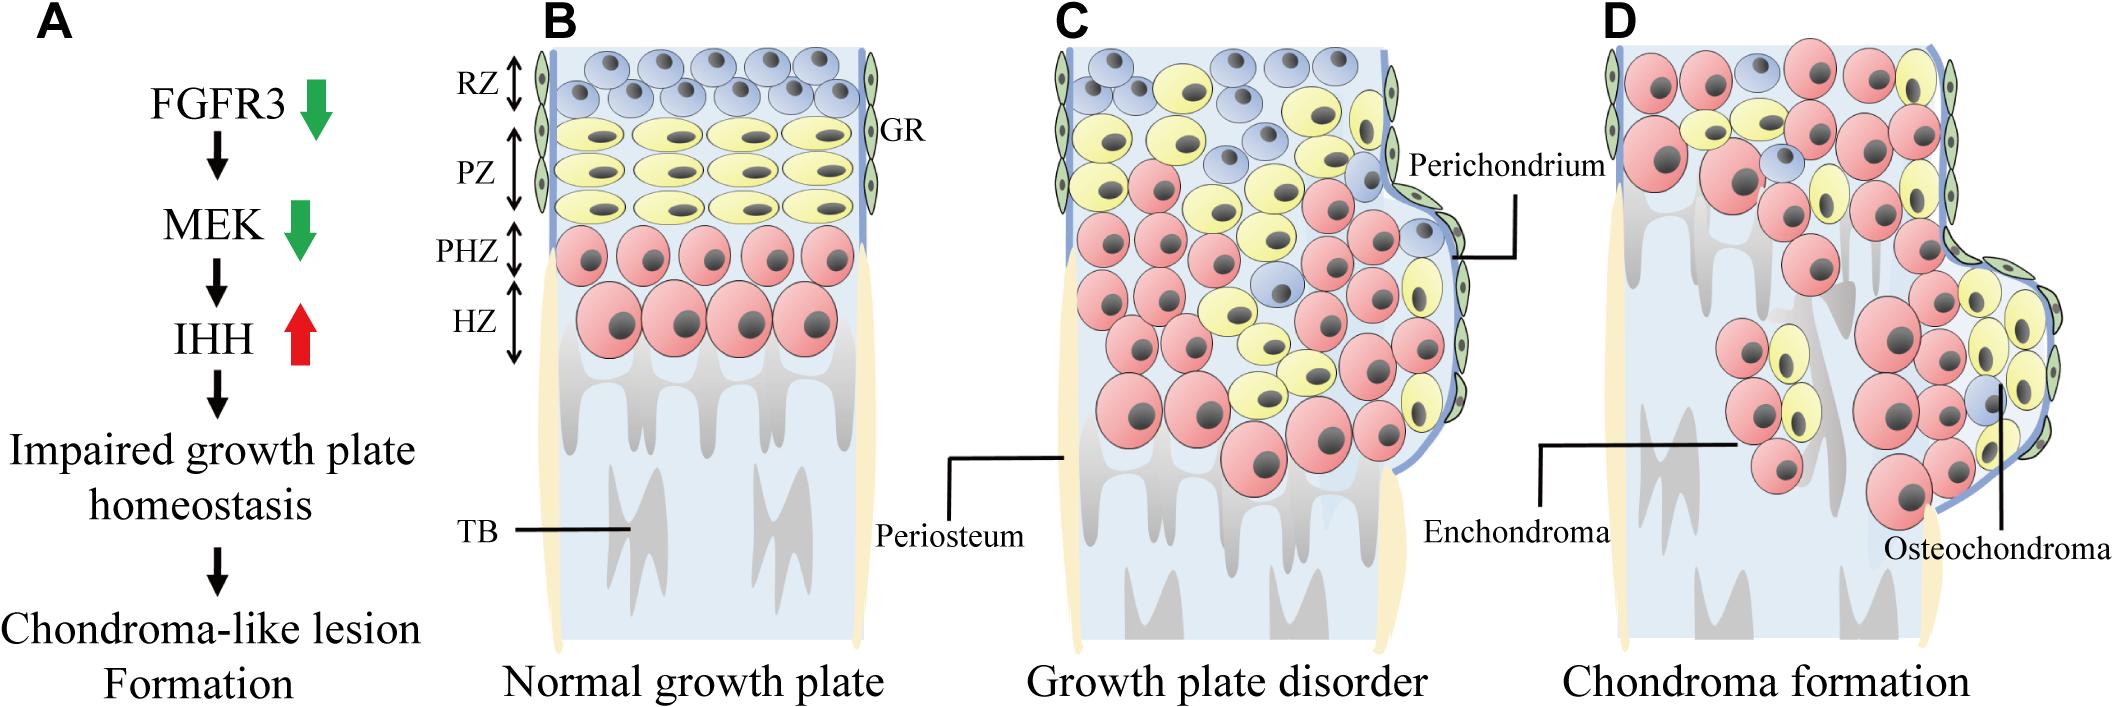 Model of chondroma-like lesion formation in <i>Fgfr3</i> cKO mice.